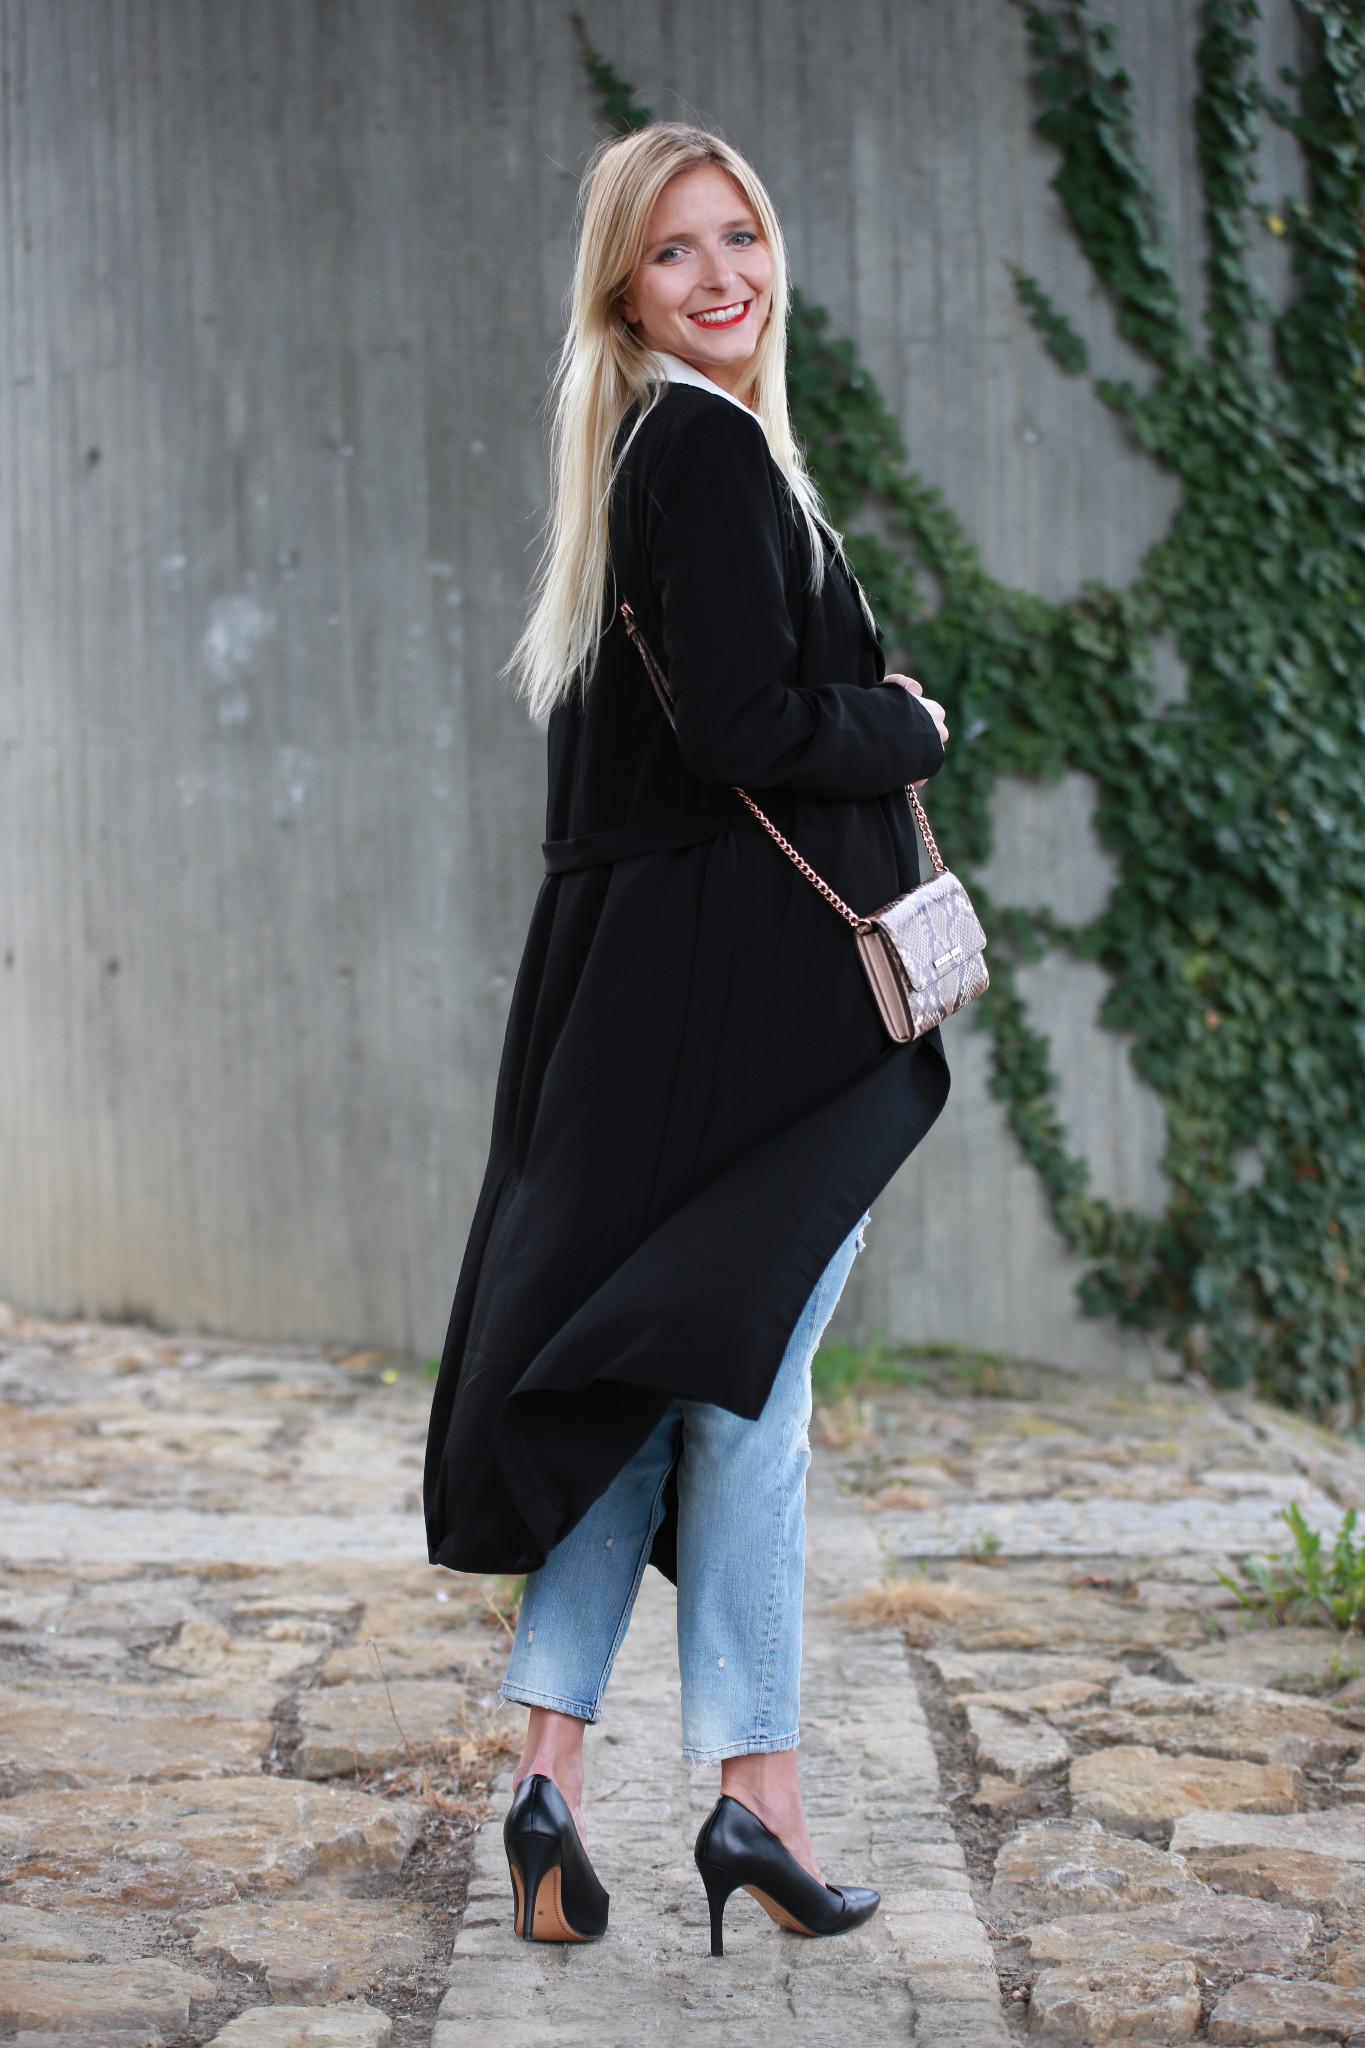 Fashion_Outfit_Michael_Kors_Jet_Set_34